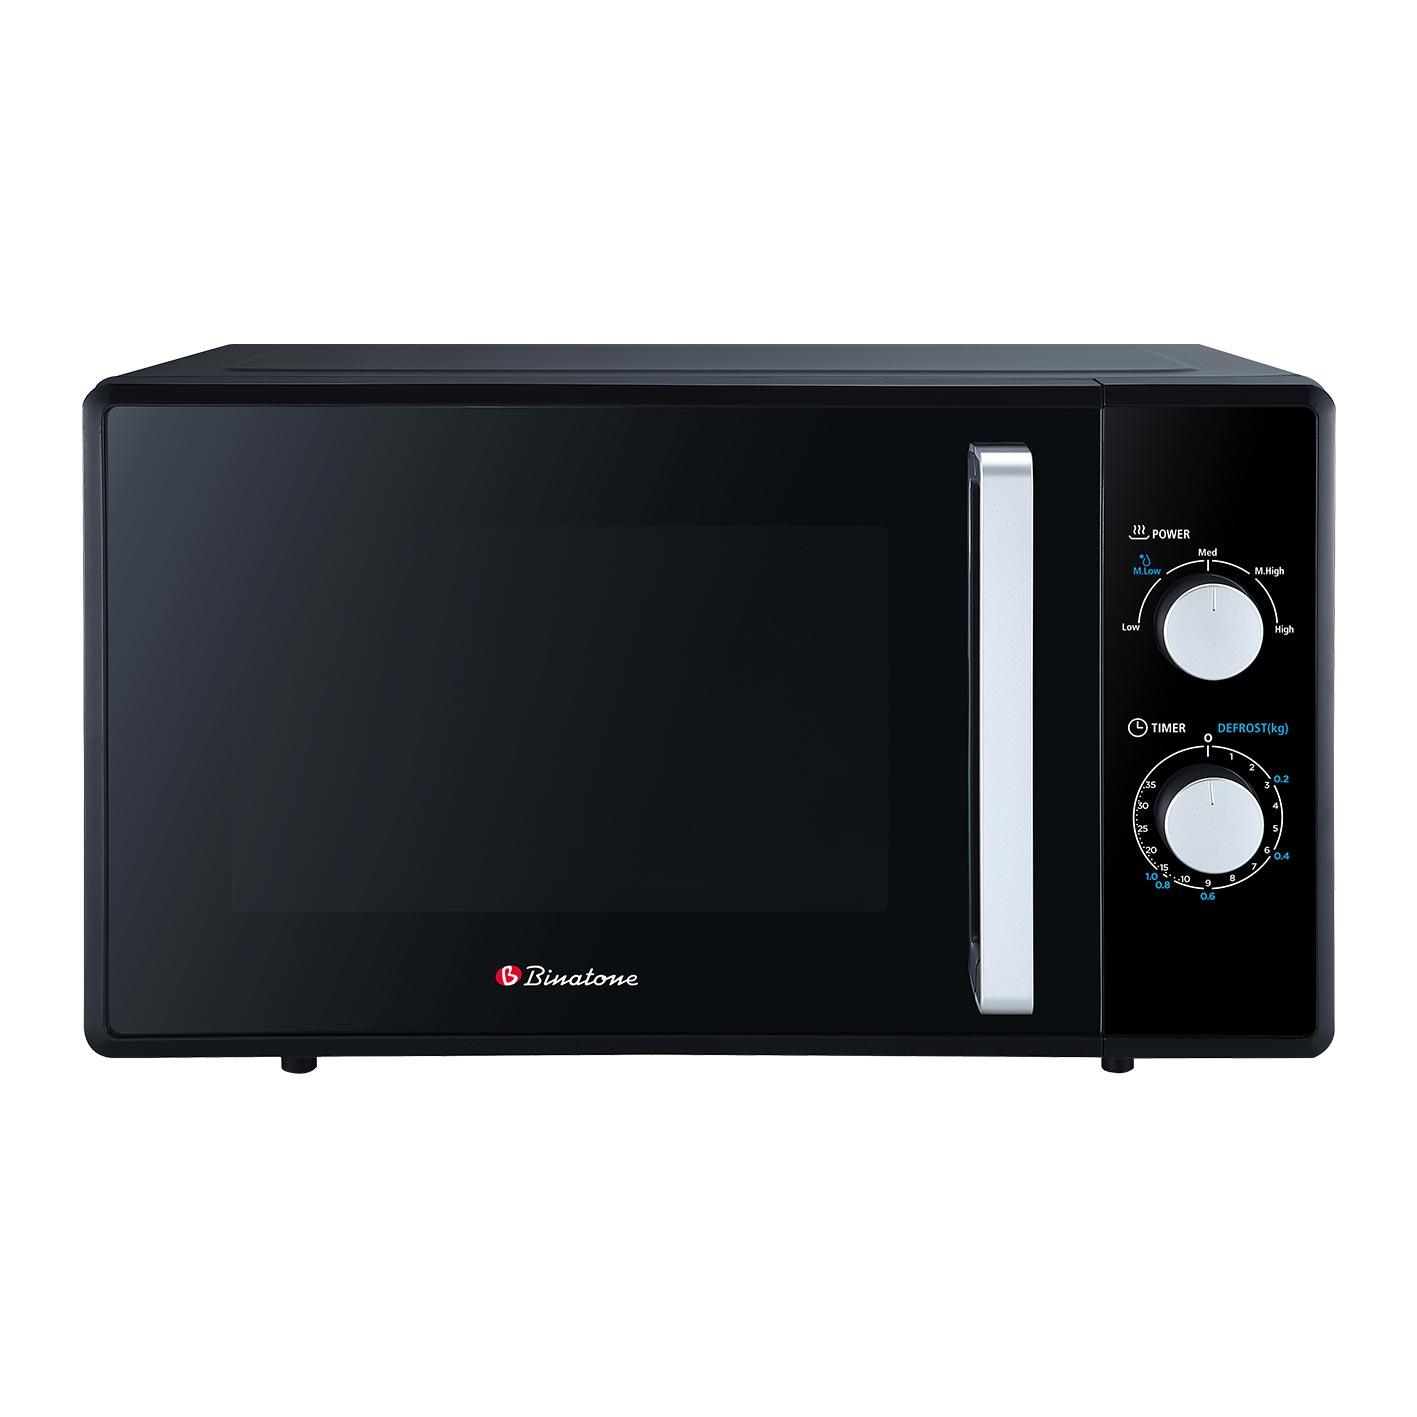 Binatone-Mwo-2520-25-Litre-Microwave-Oven-Black